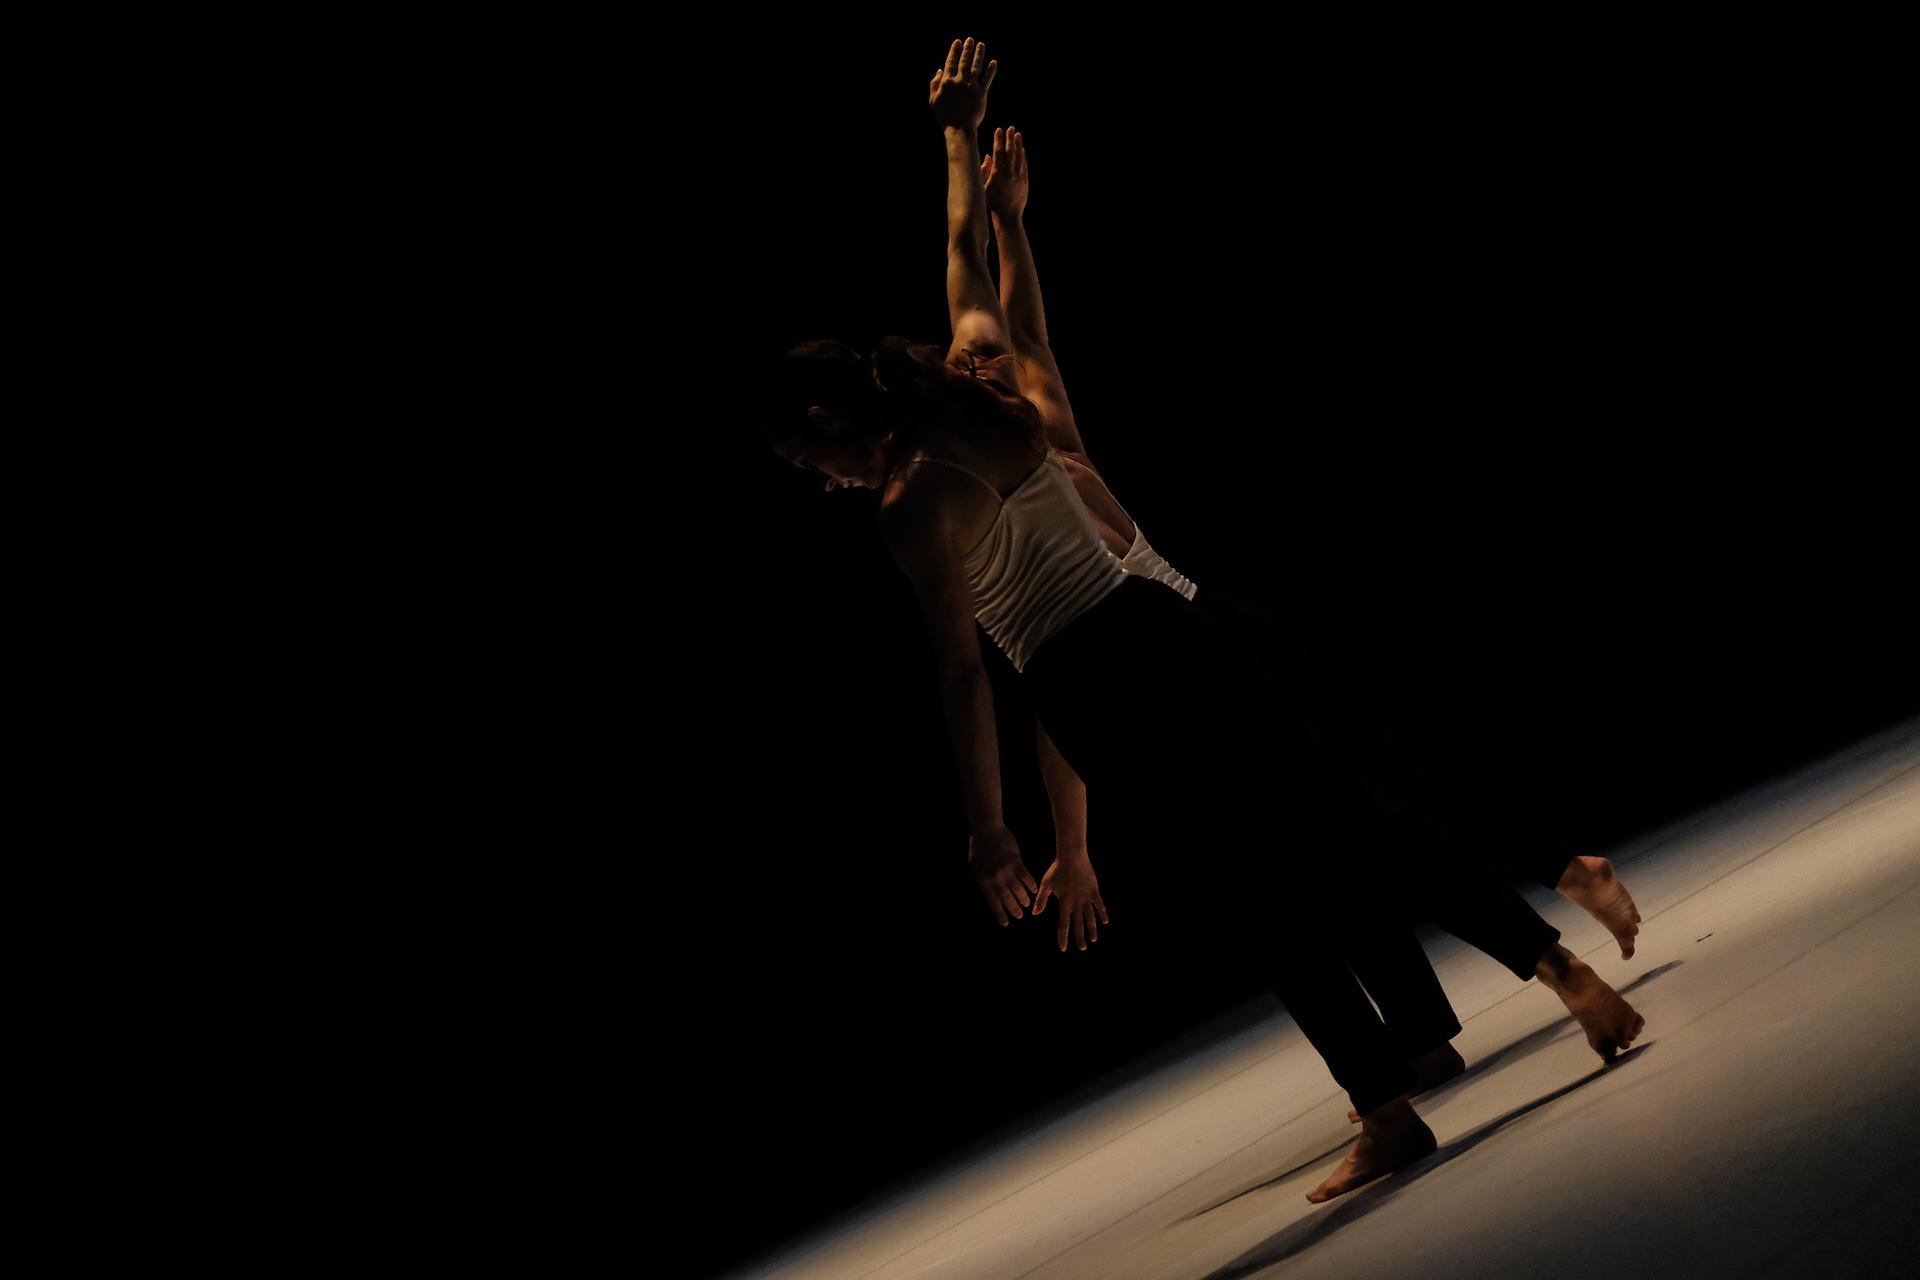 Manfredi Perego / Geografie dell'istante / TIR Danza